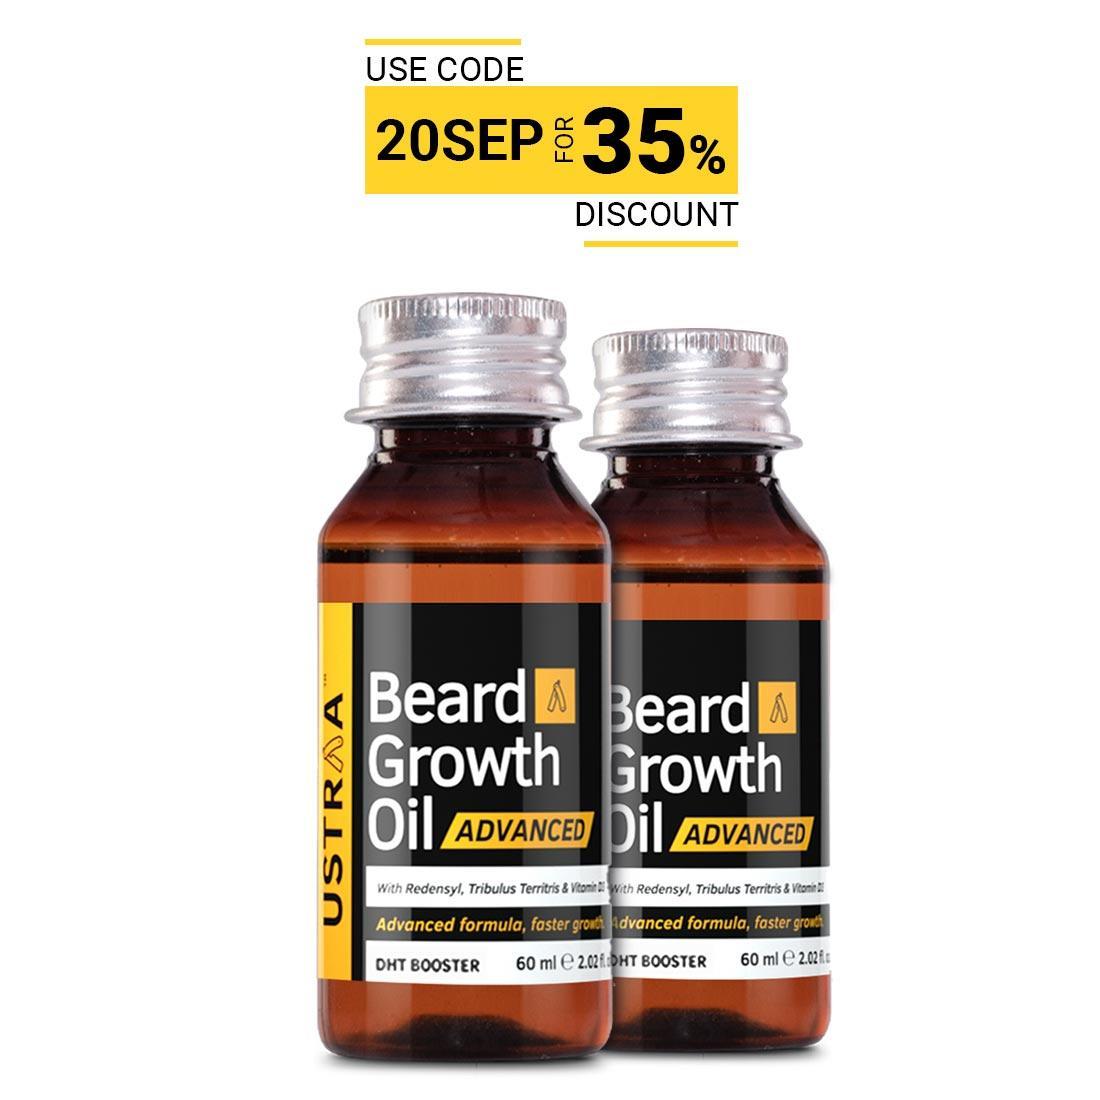 Beard Growth Oil- Advanced - Set of 2